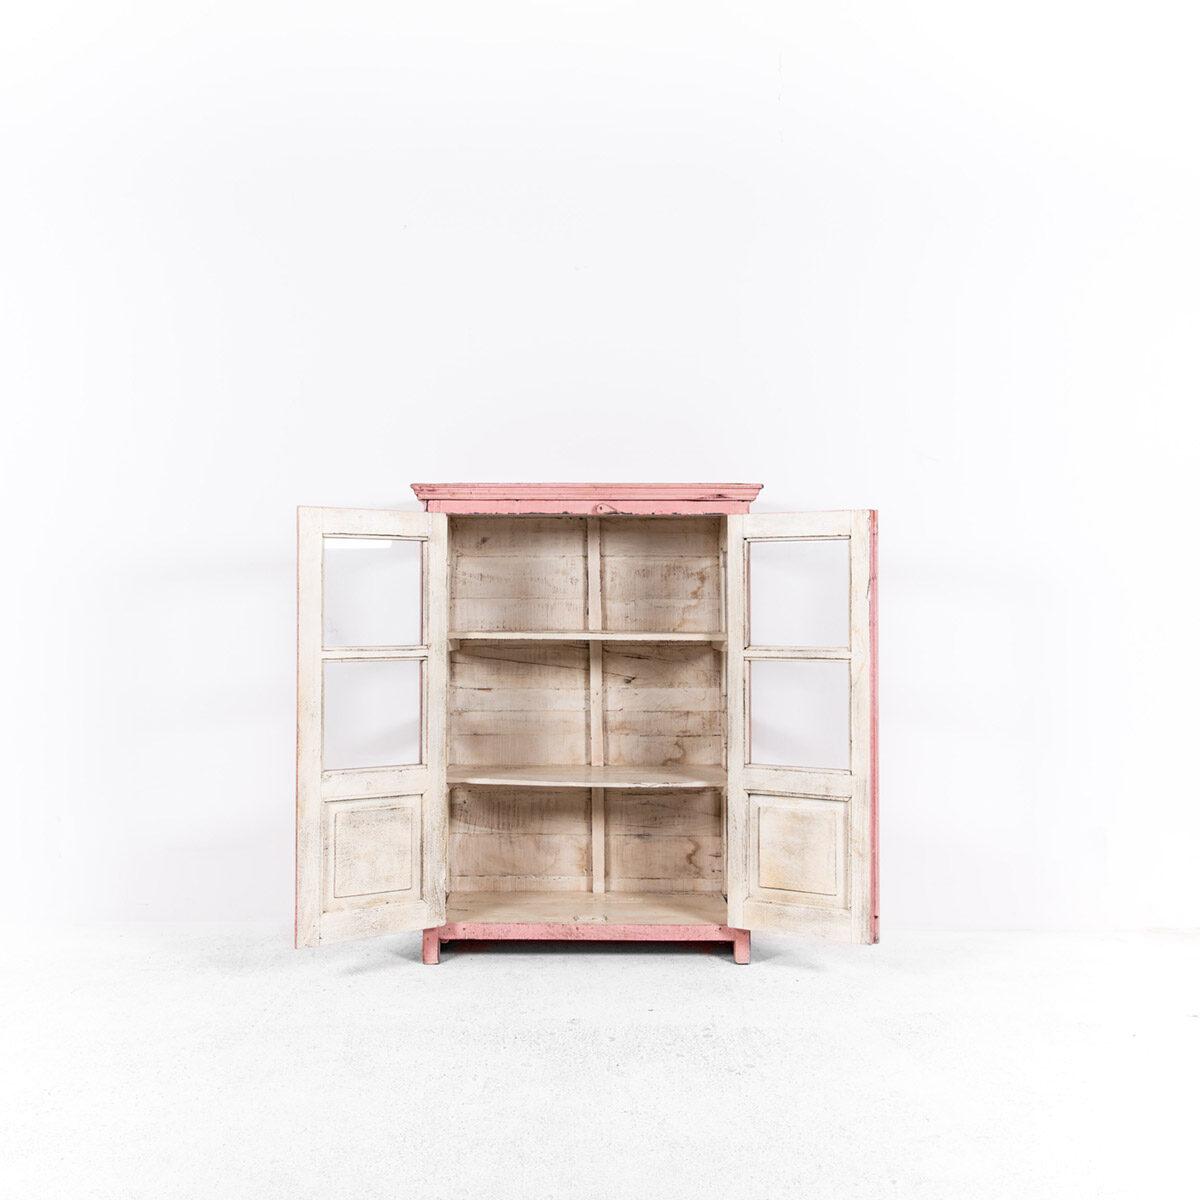 Roze-vitrinekast-2-glazen-deuren-6